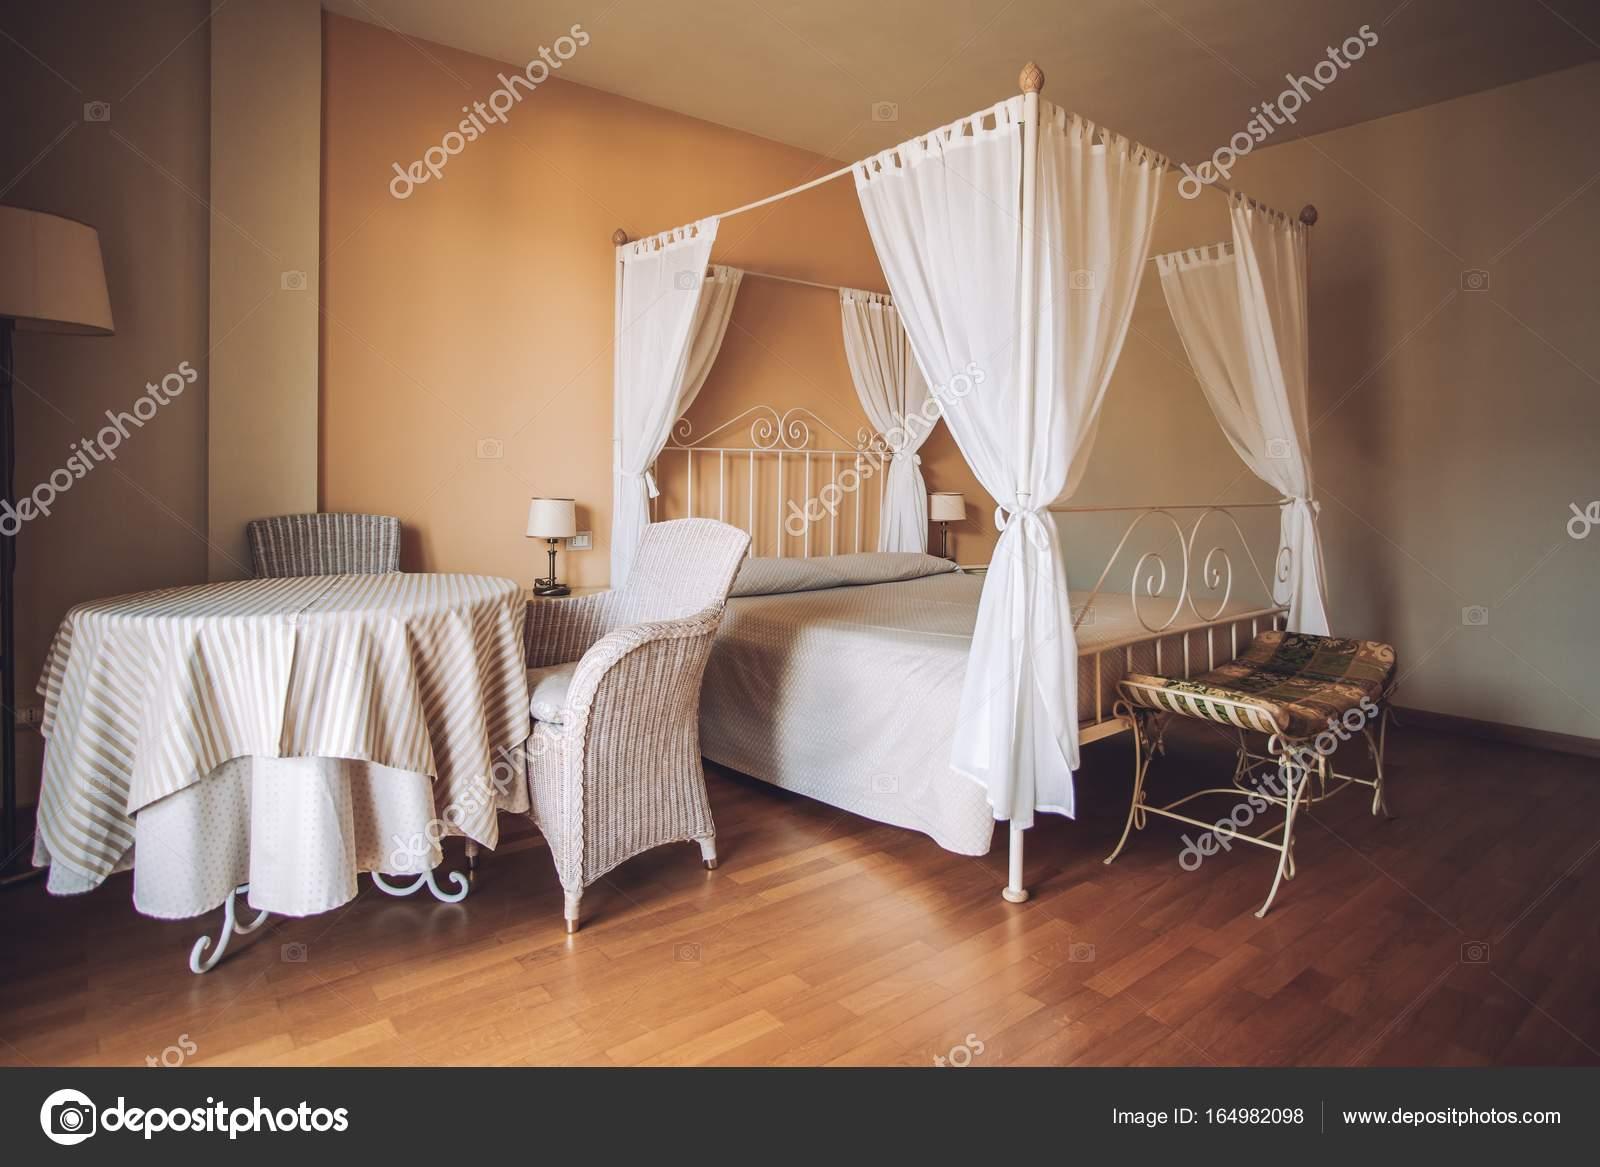 Schlafzimmer In Hellen Farben. Großes Bequemes Doppelbett Im Eleganten  Klassischen Interieur U2014 Stockfoto